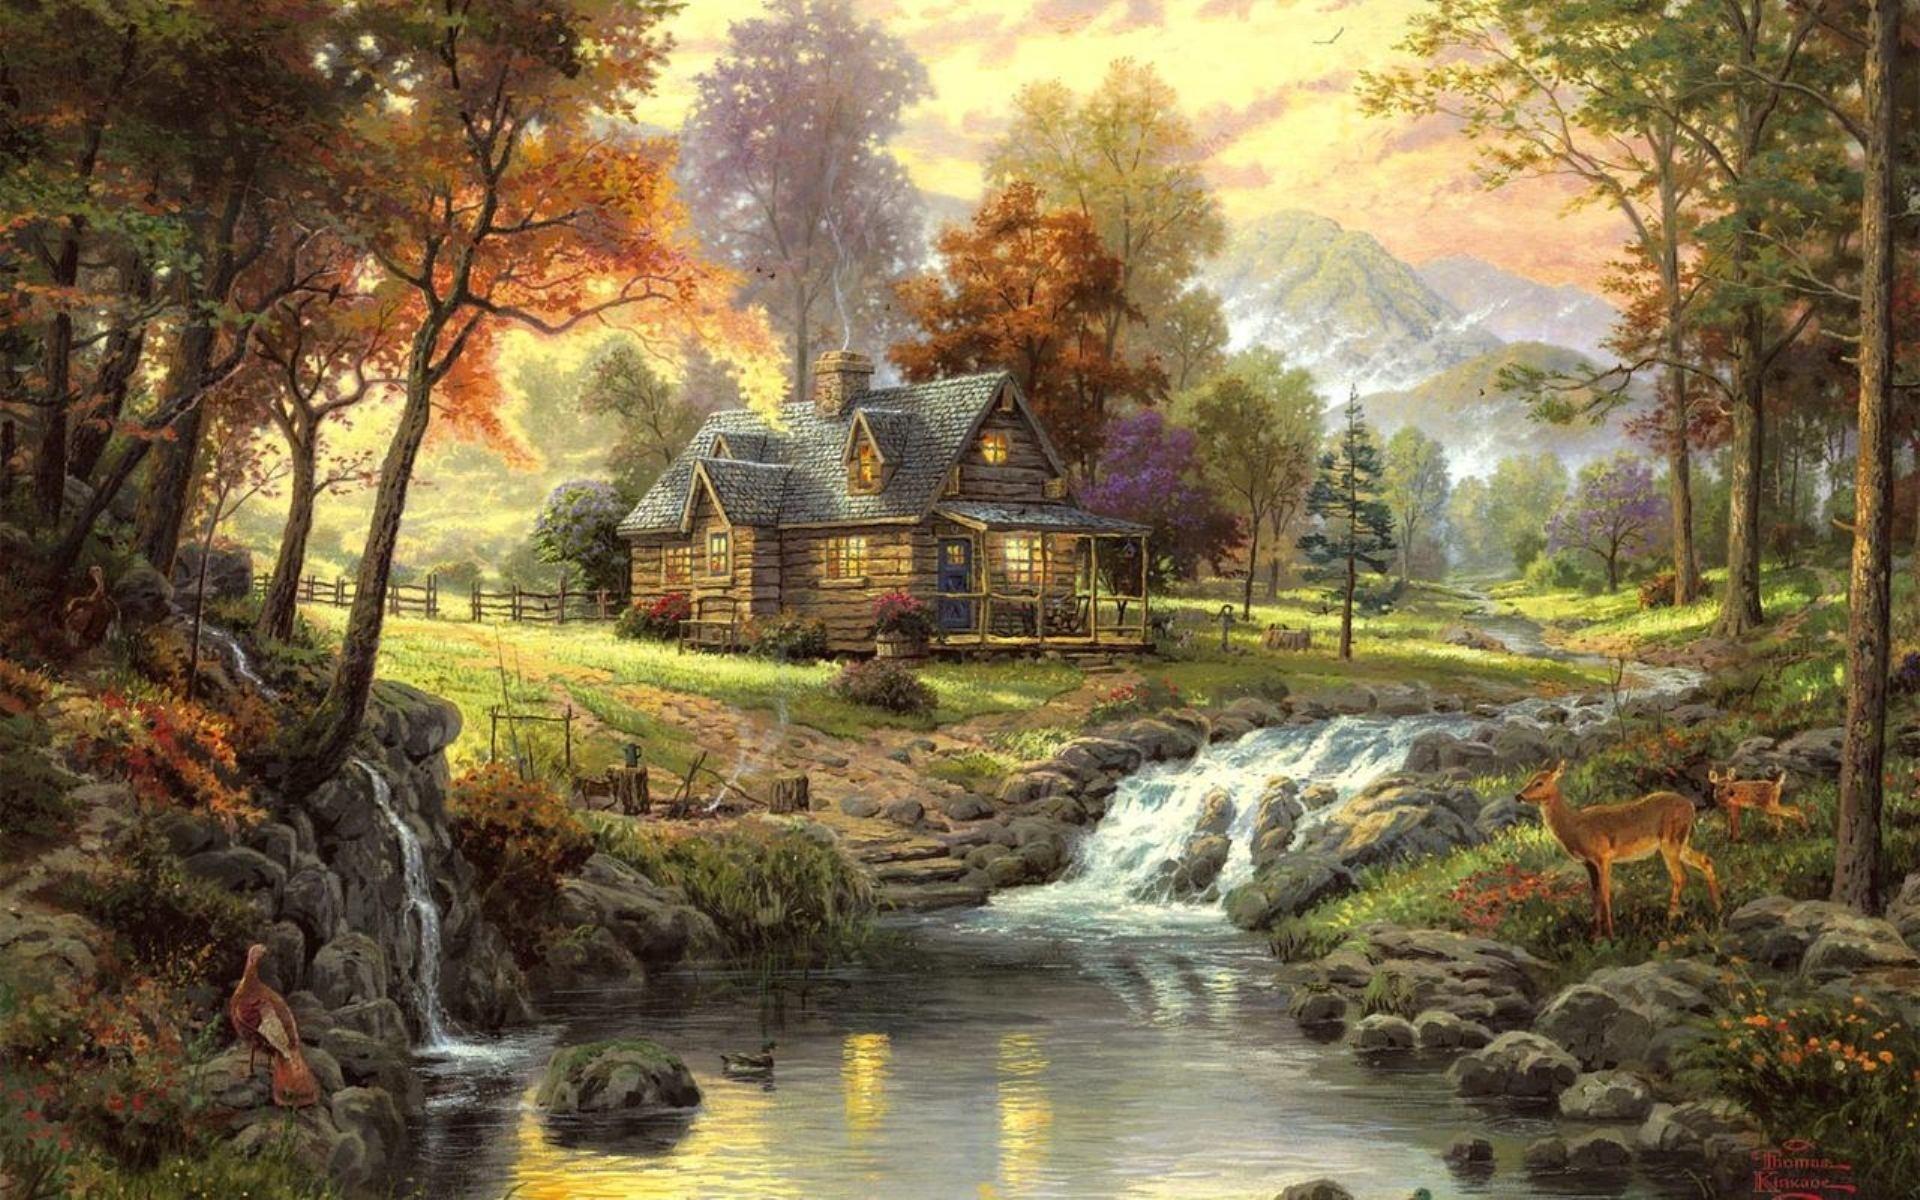 houses artistic mountains wallpaper 1920x1200 24310 WallpaperUP 1920x1200